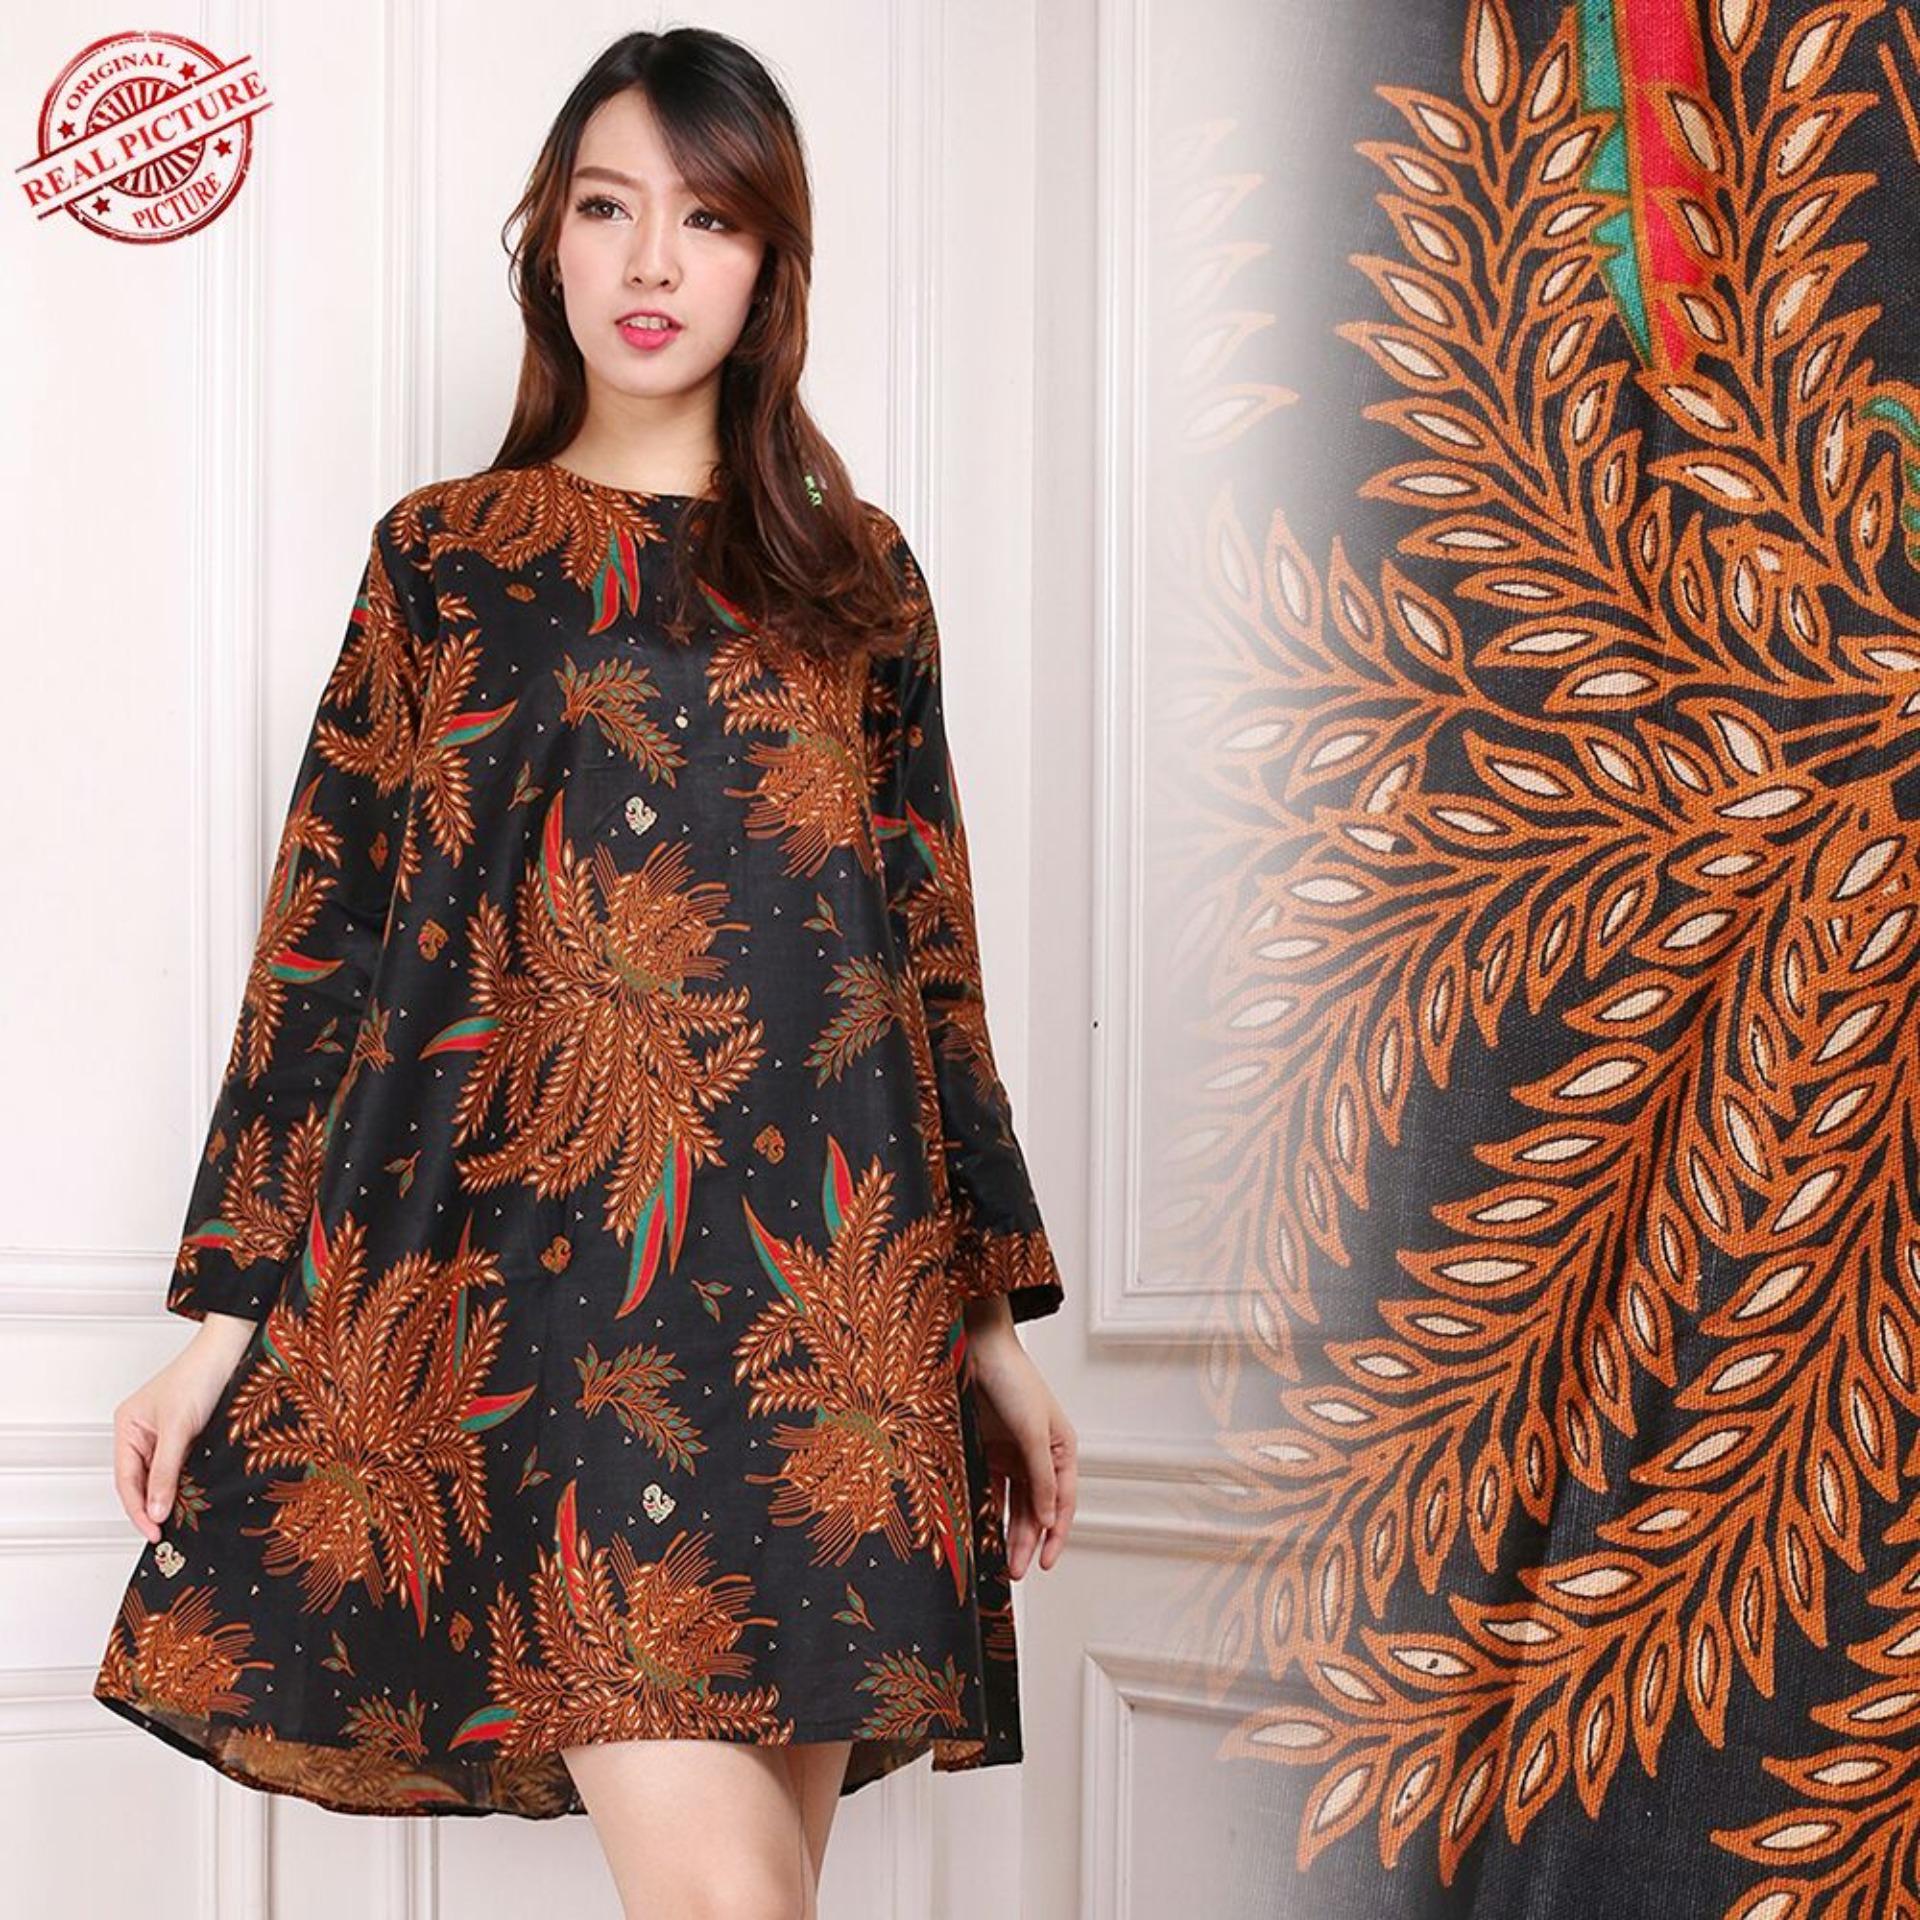 168 Collection Atasan Blouse Batik Gladys Kemeja Long Tunik Wanita